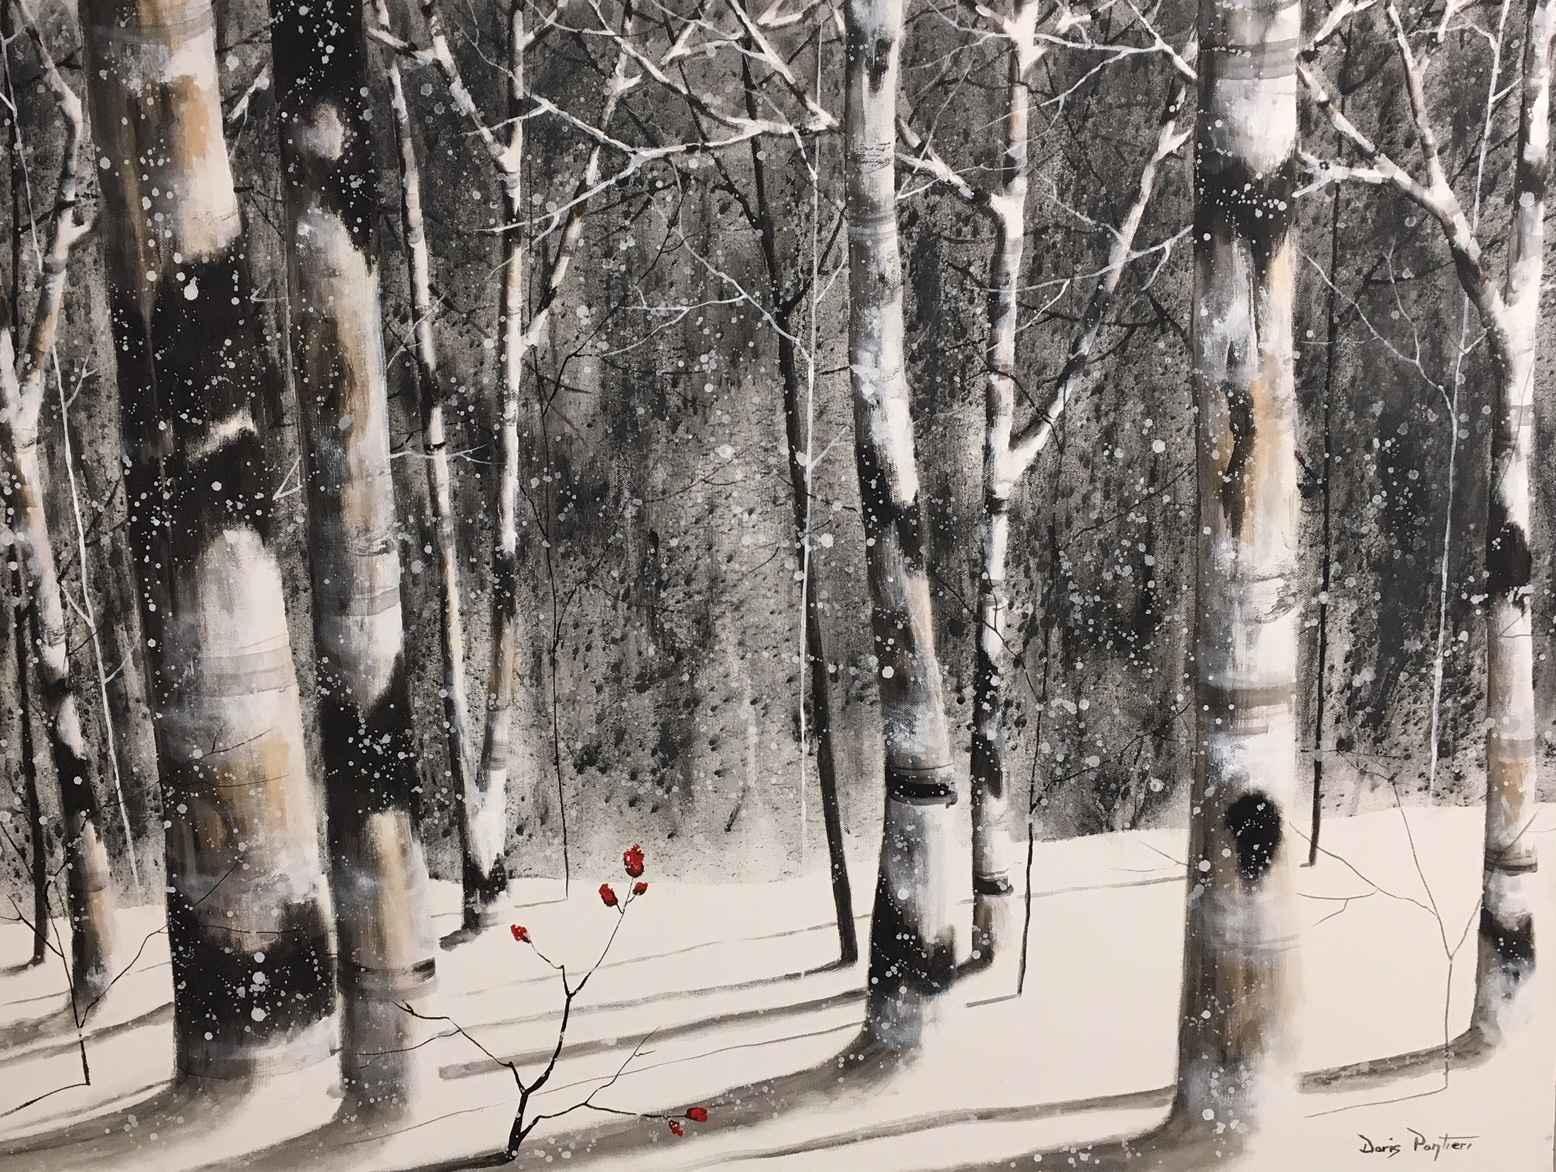 A Winter's Day by  Doris Pontieri - Masterpiece Online